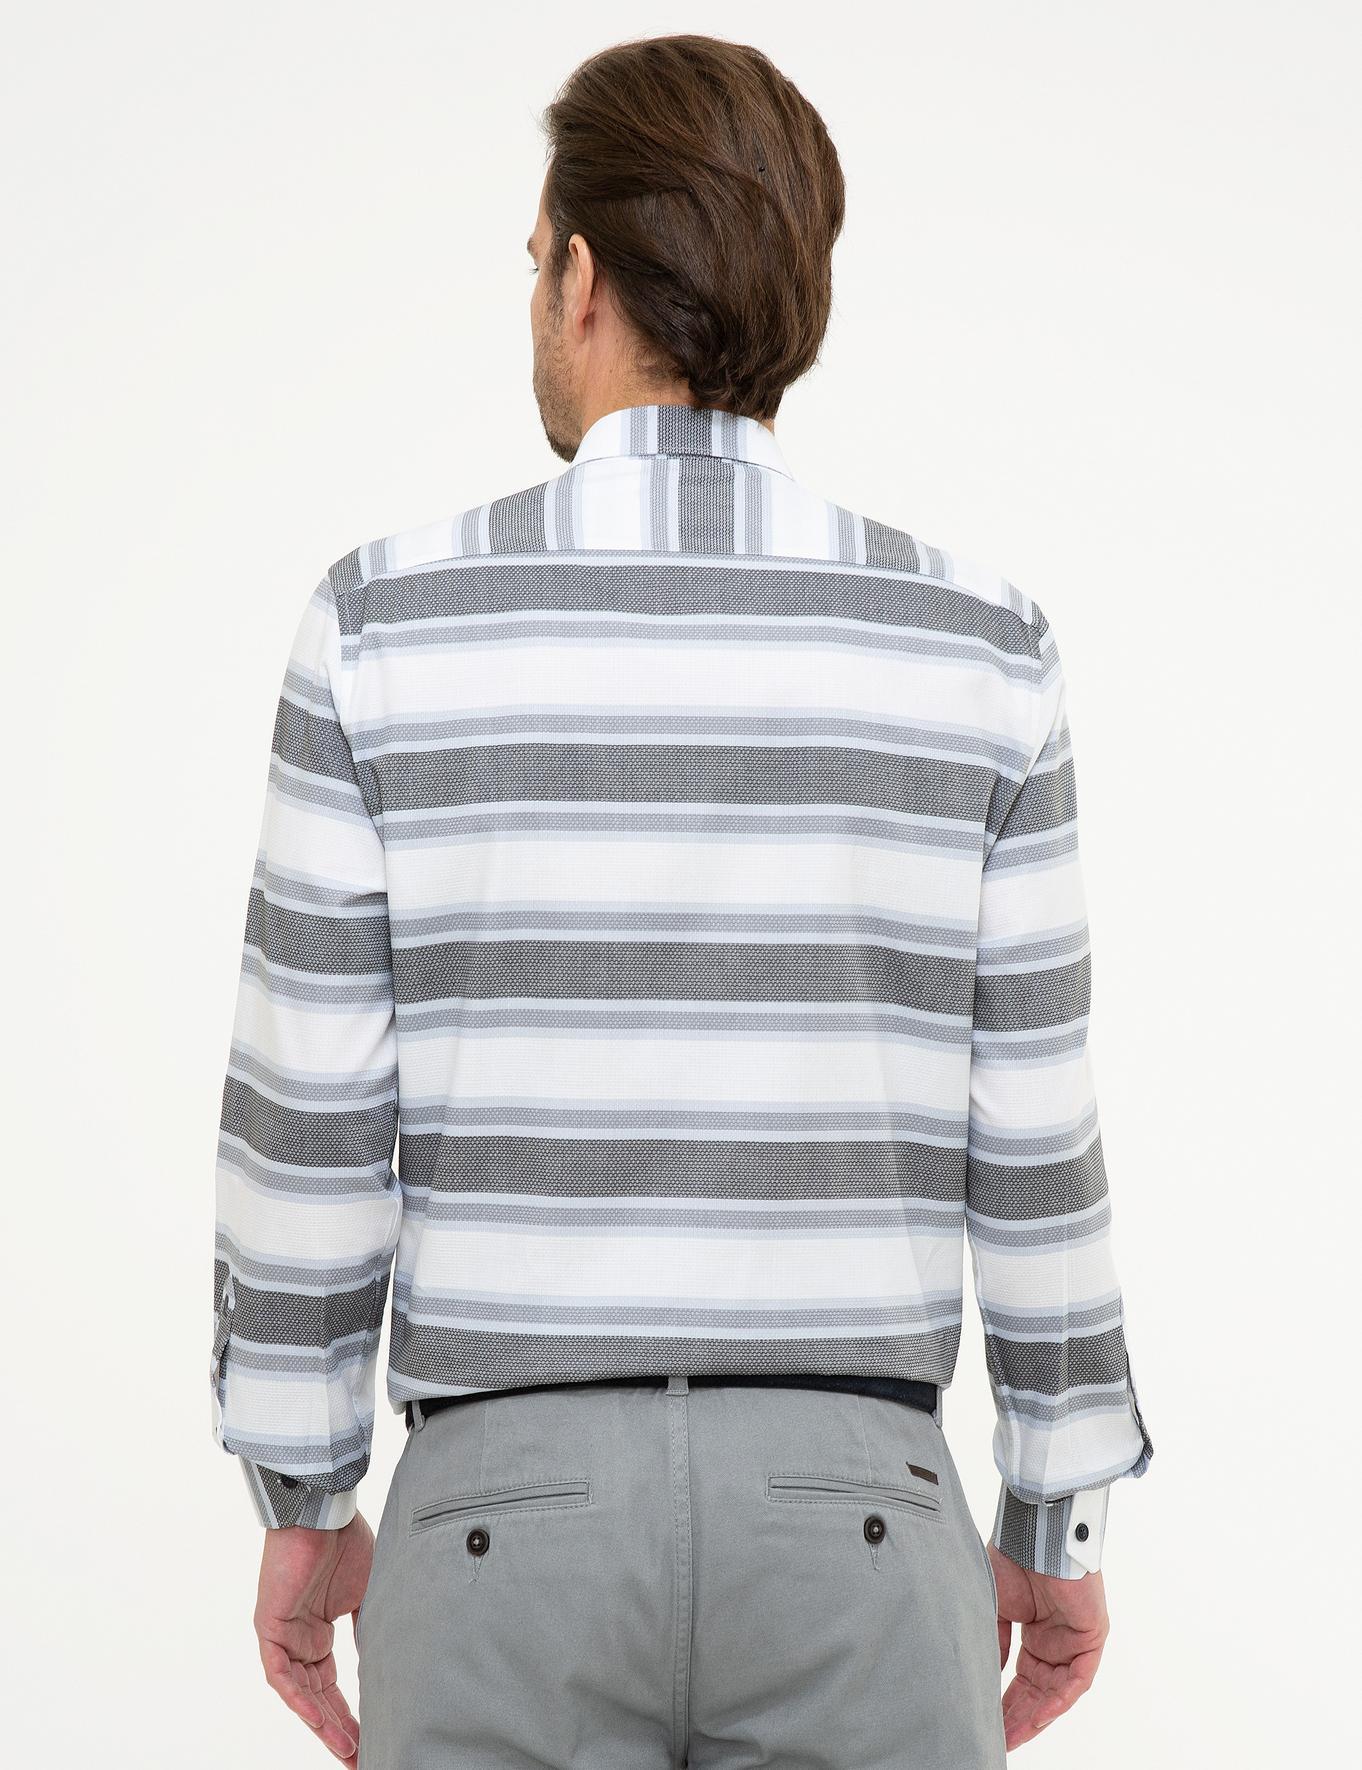 Mavi Detaylı Slim Fit Gömlek